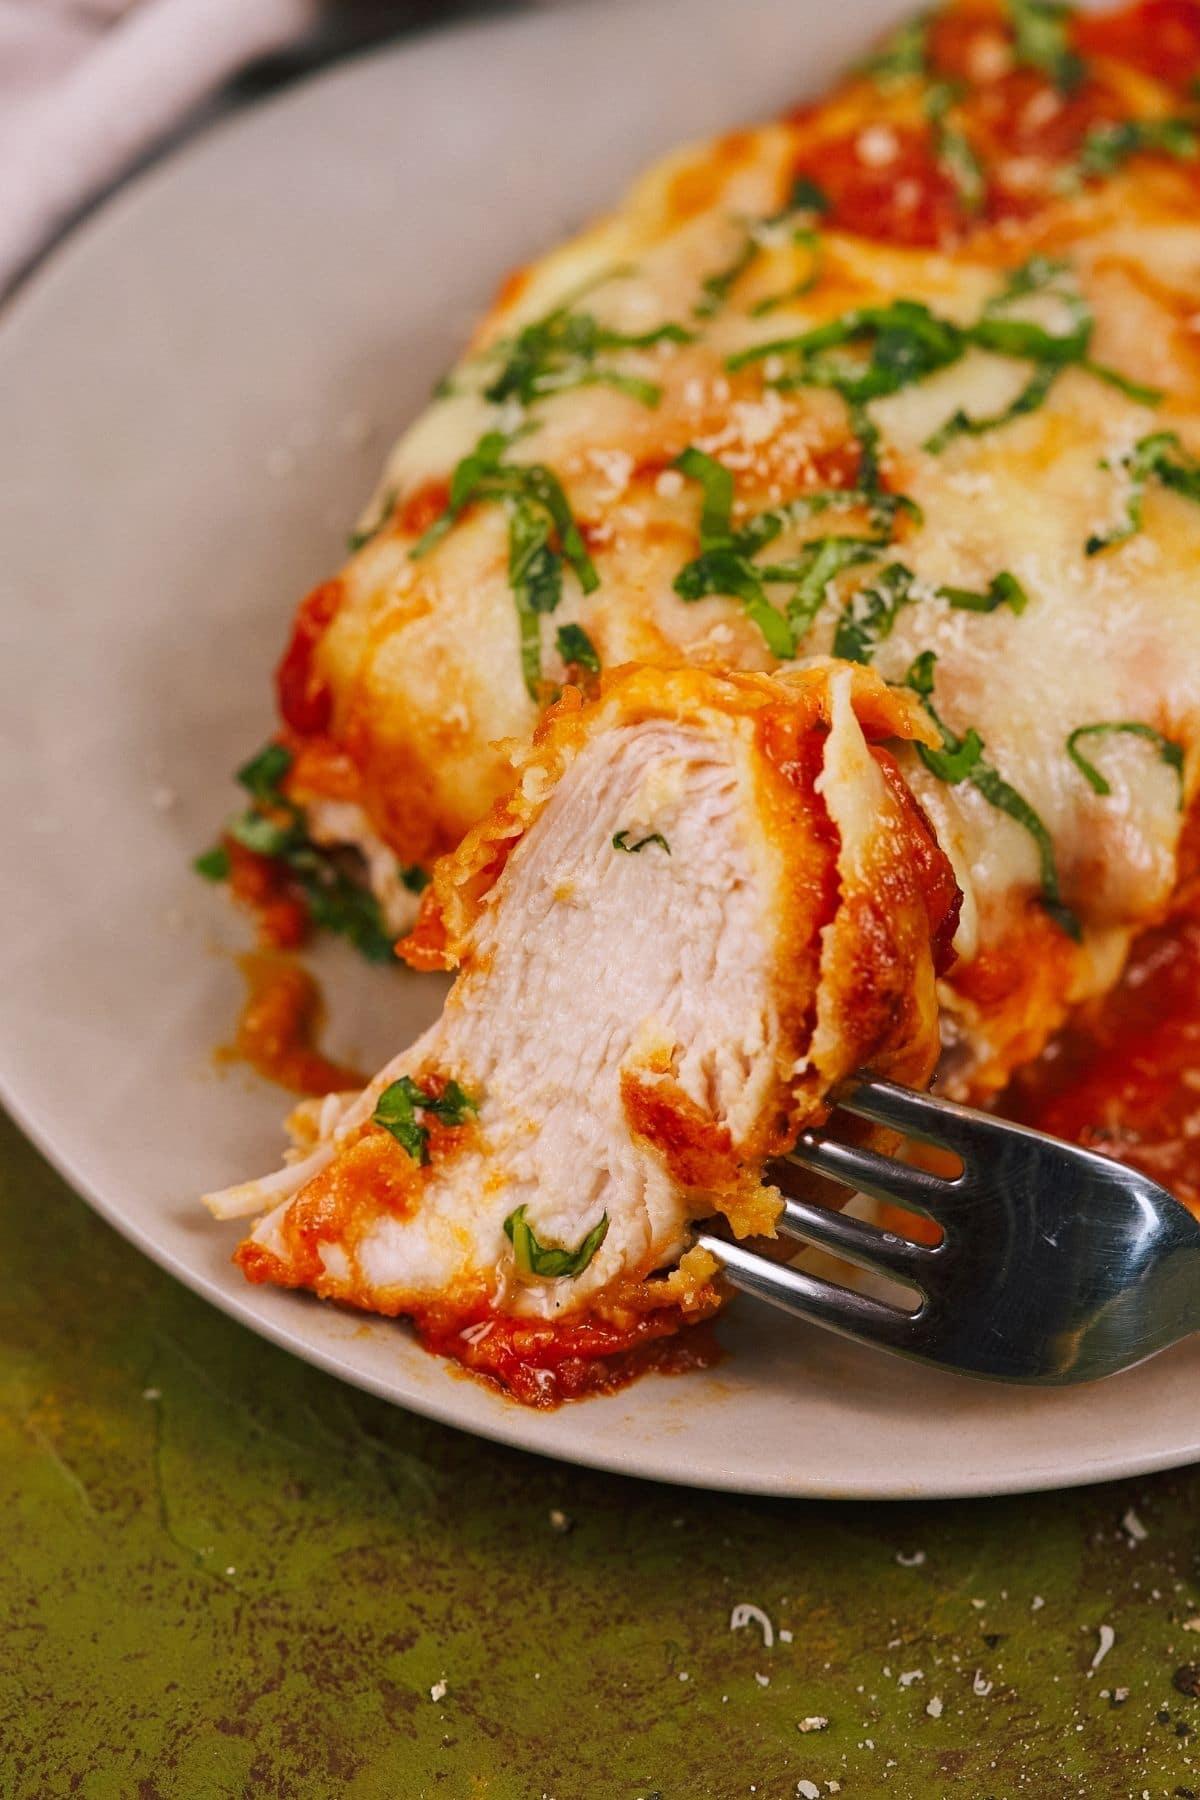 Fork holding chicken slice on plate